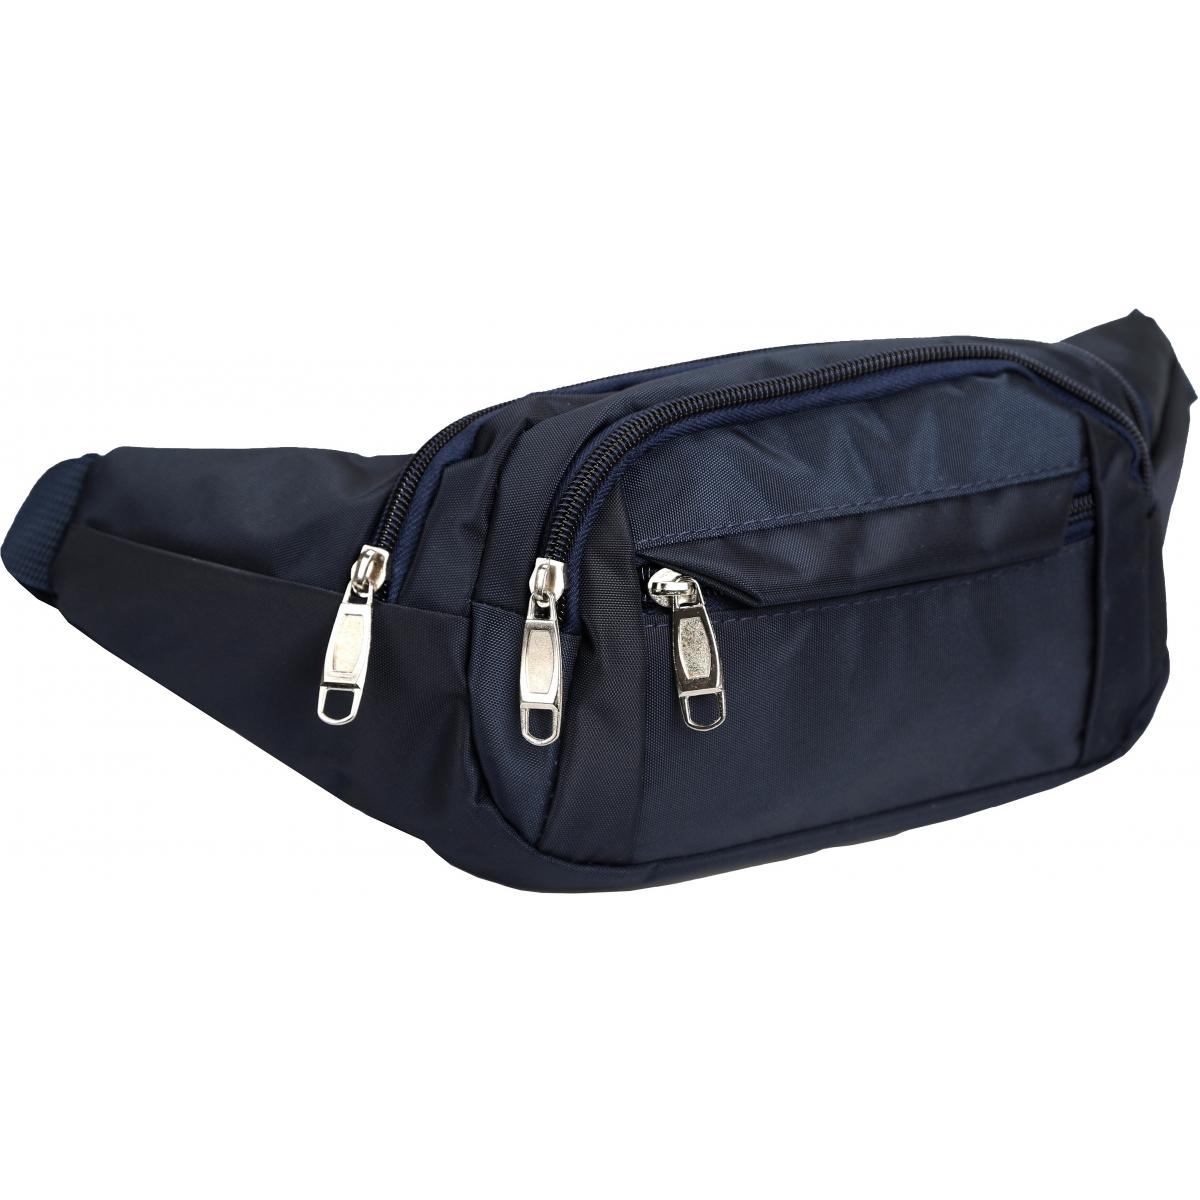 sac banane homme les sacs de krlot hkg0497 couleur bleu. Black Bedroom Furniture Sets. Home Design Ideas